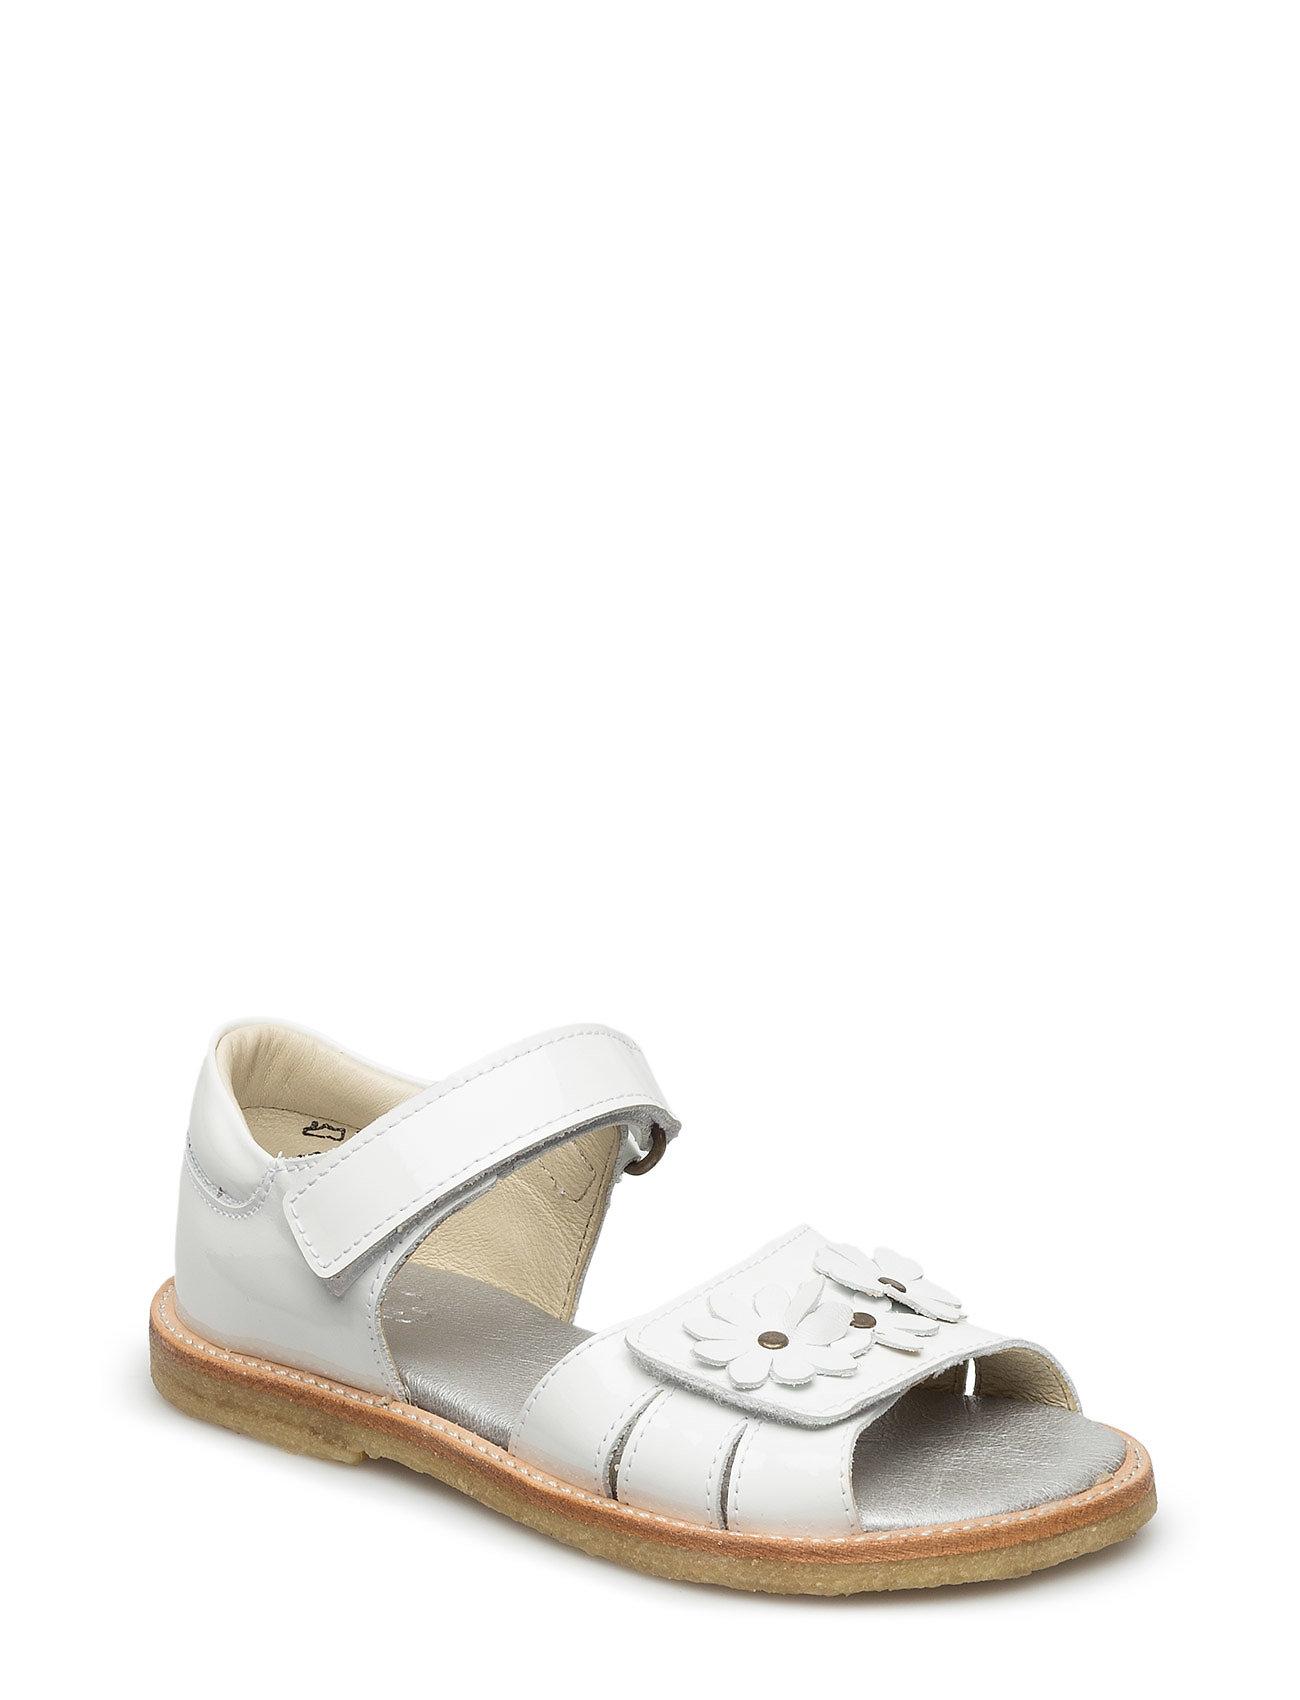 arauto rap Ecological open sandal, wide width fra boozt.com dk